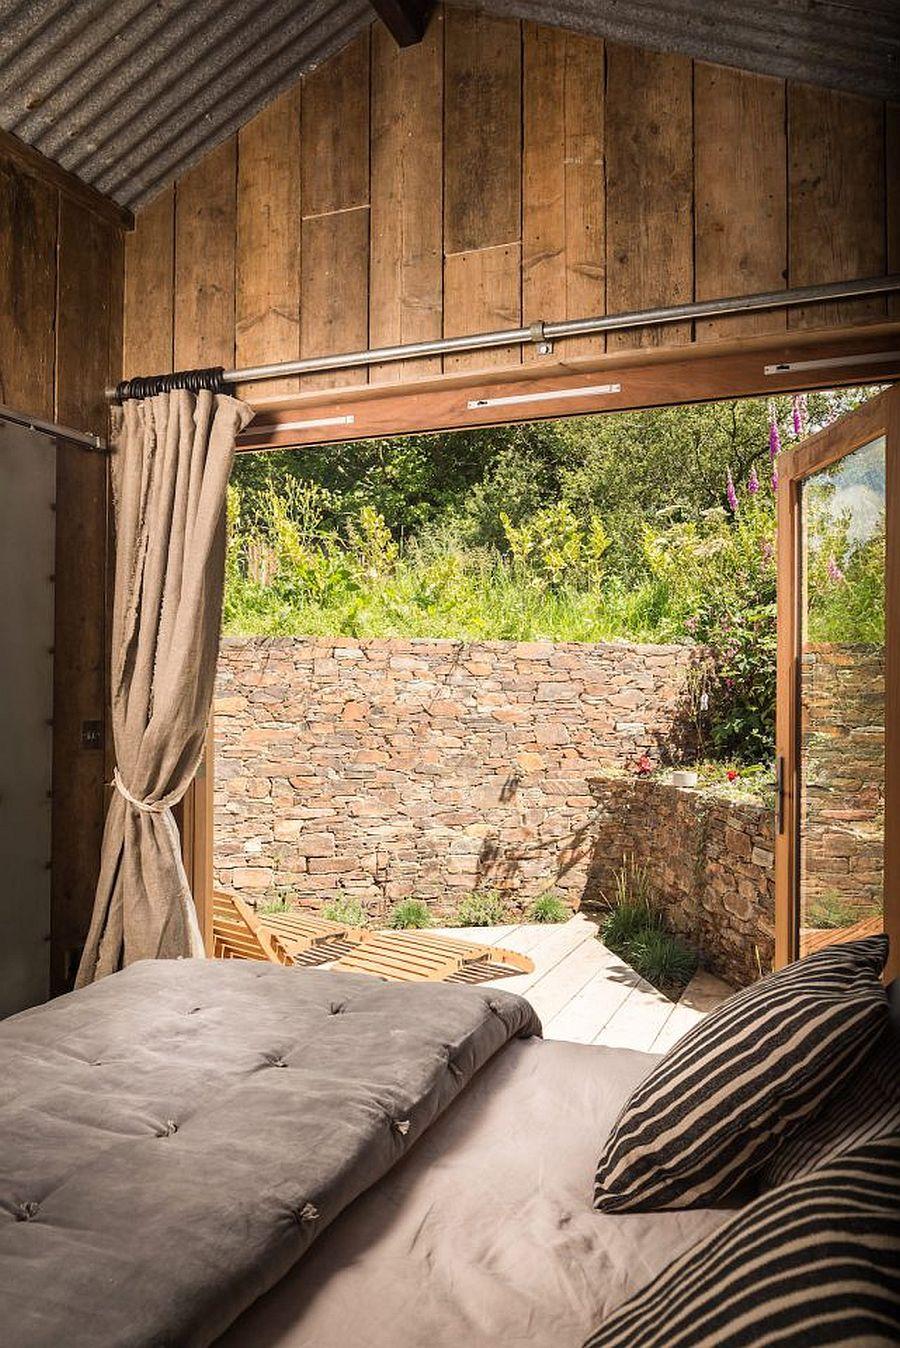 adelaparvu.com despre cabana rustica si tuse industriale, Firefly Cabin, Cornwall, Anglia, Foto Unique Home Stays (5)